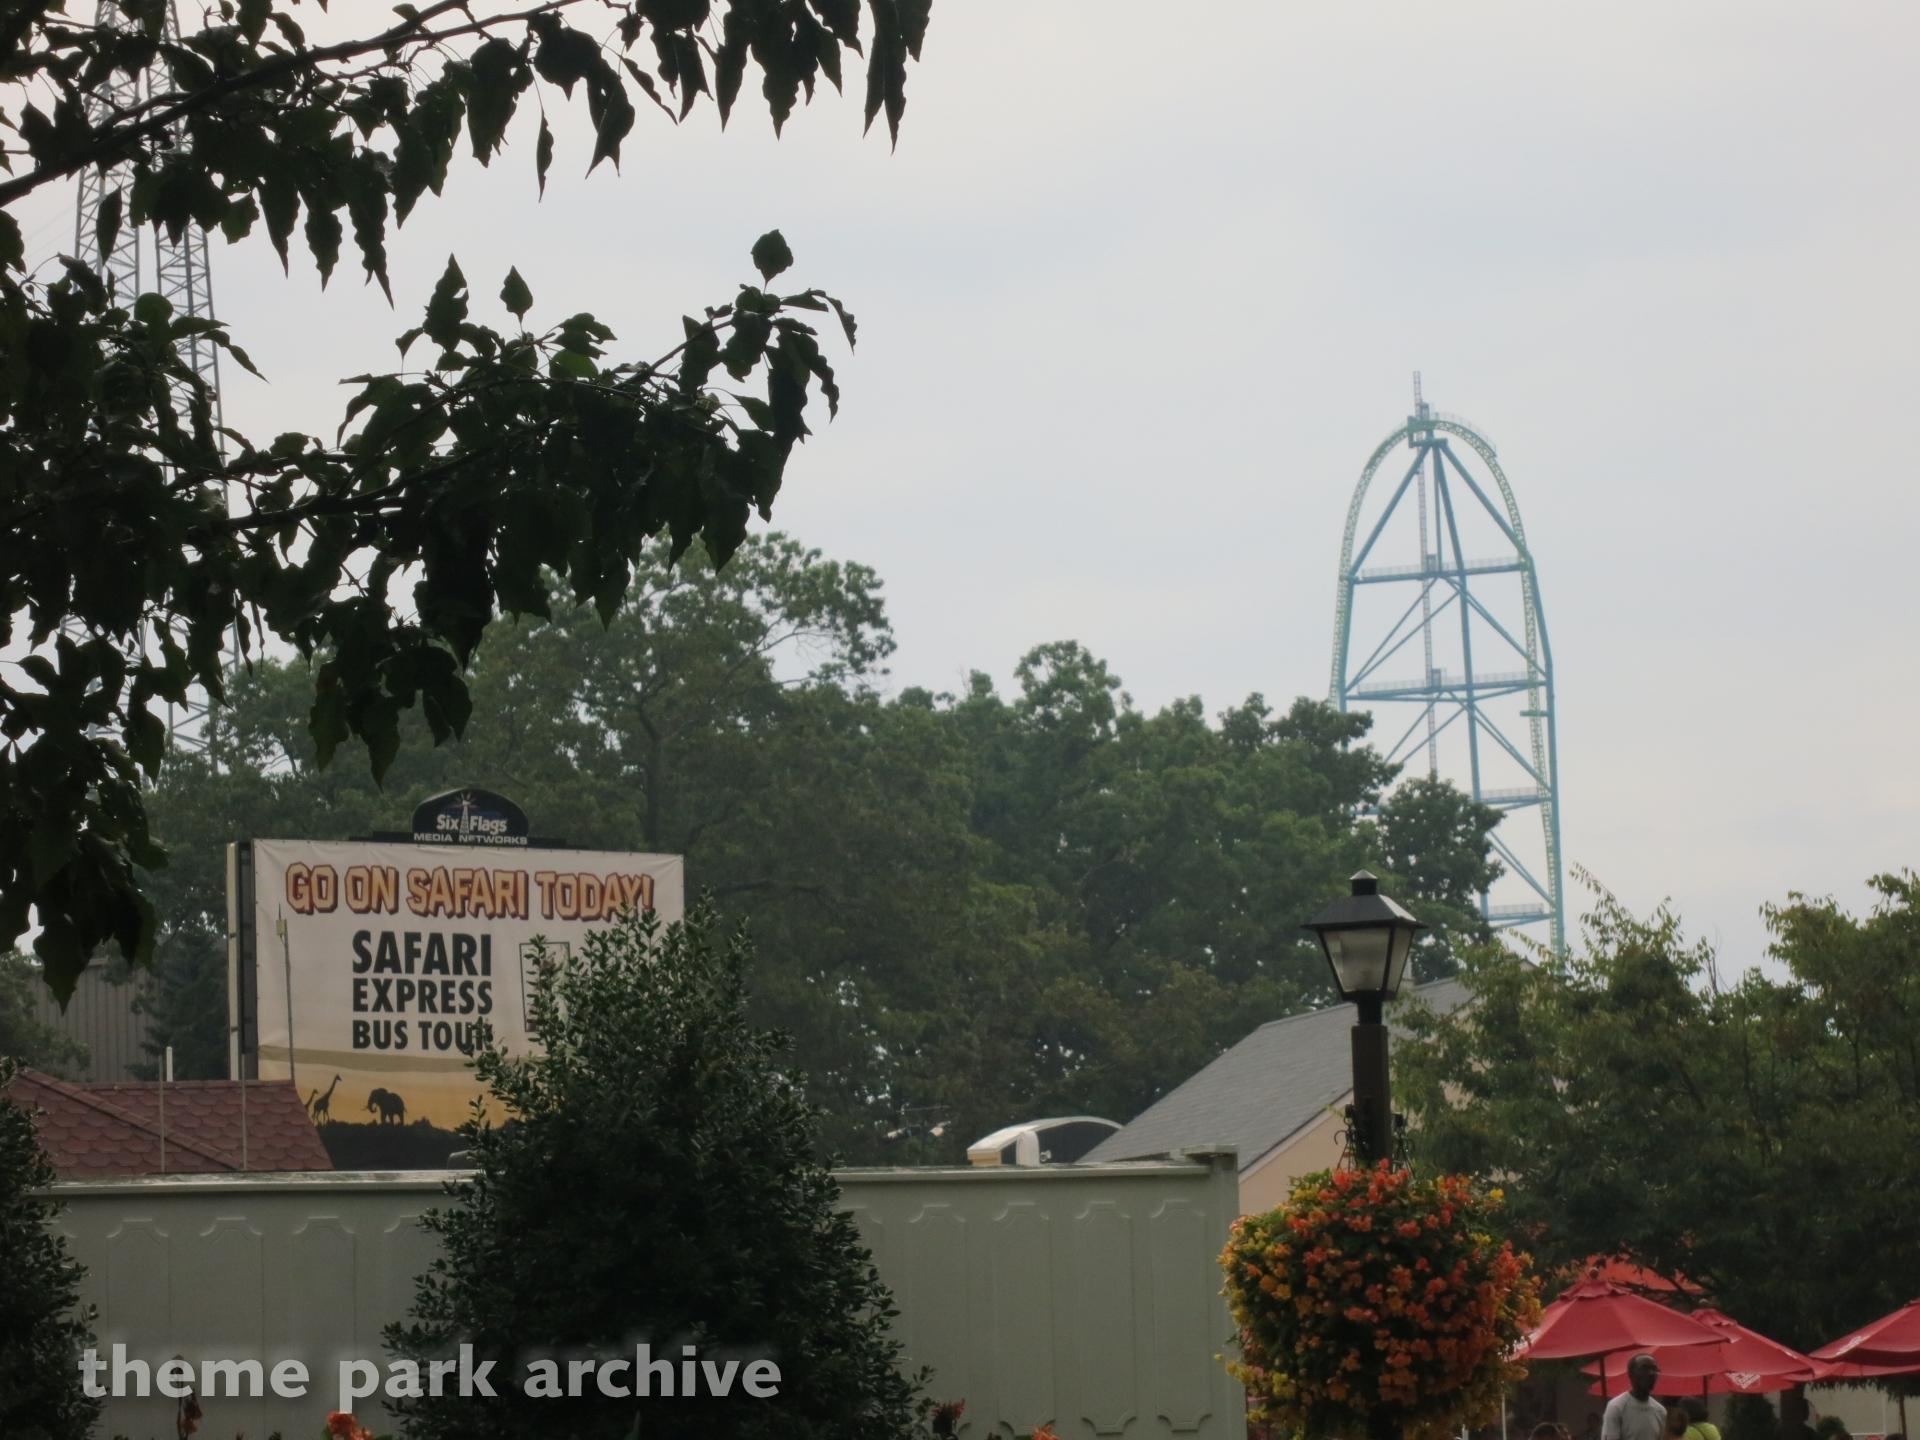 Kingda Ka at Six Flags Great Adventure